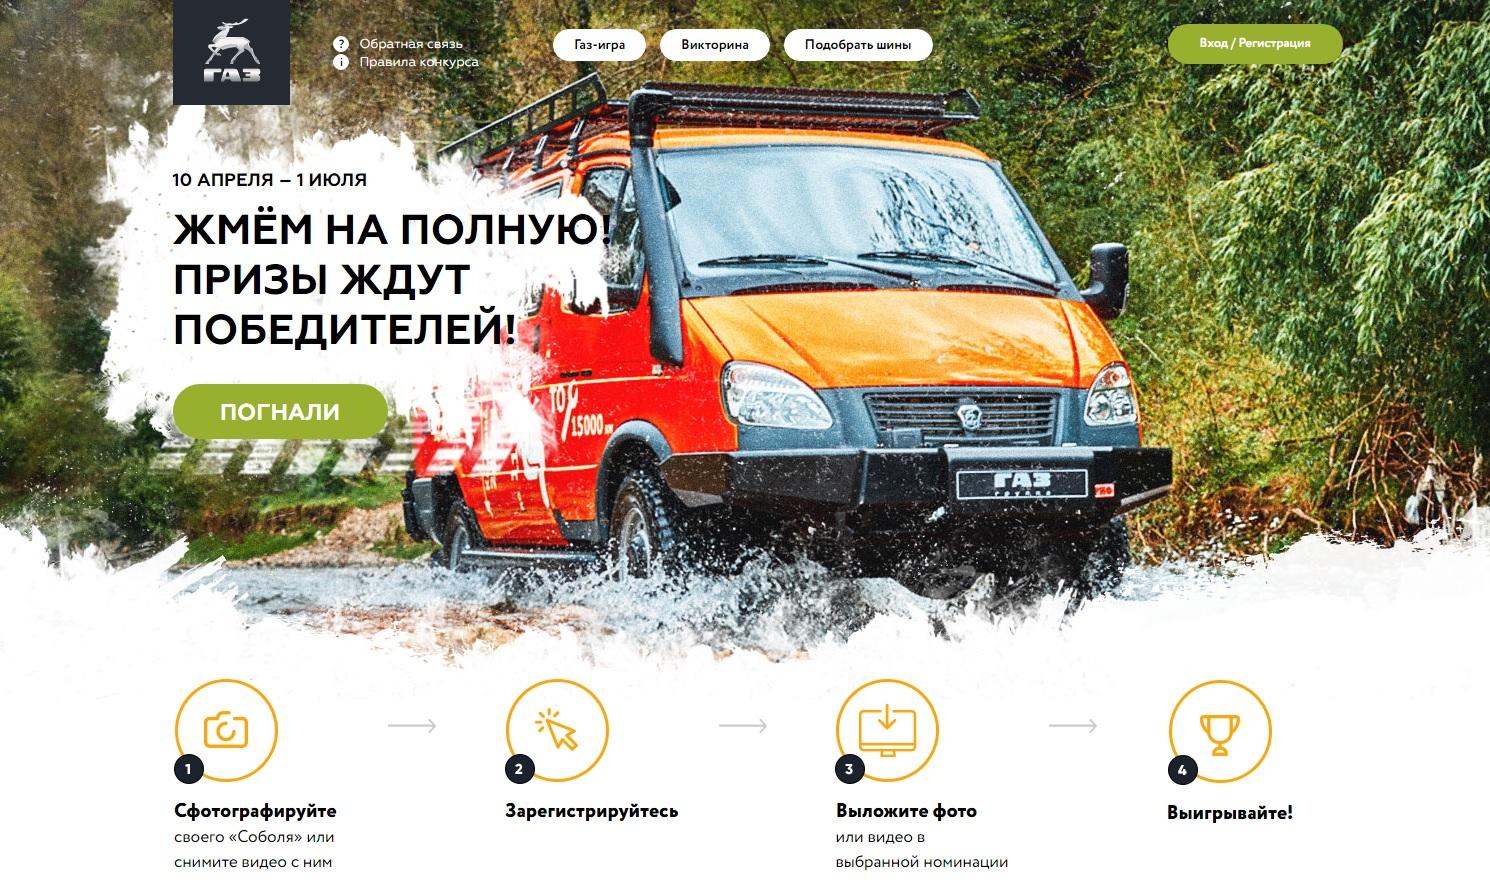 www.sobolprize.ru акция 2019 года